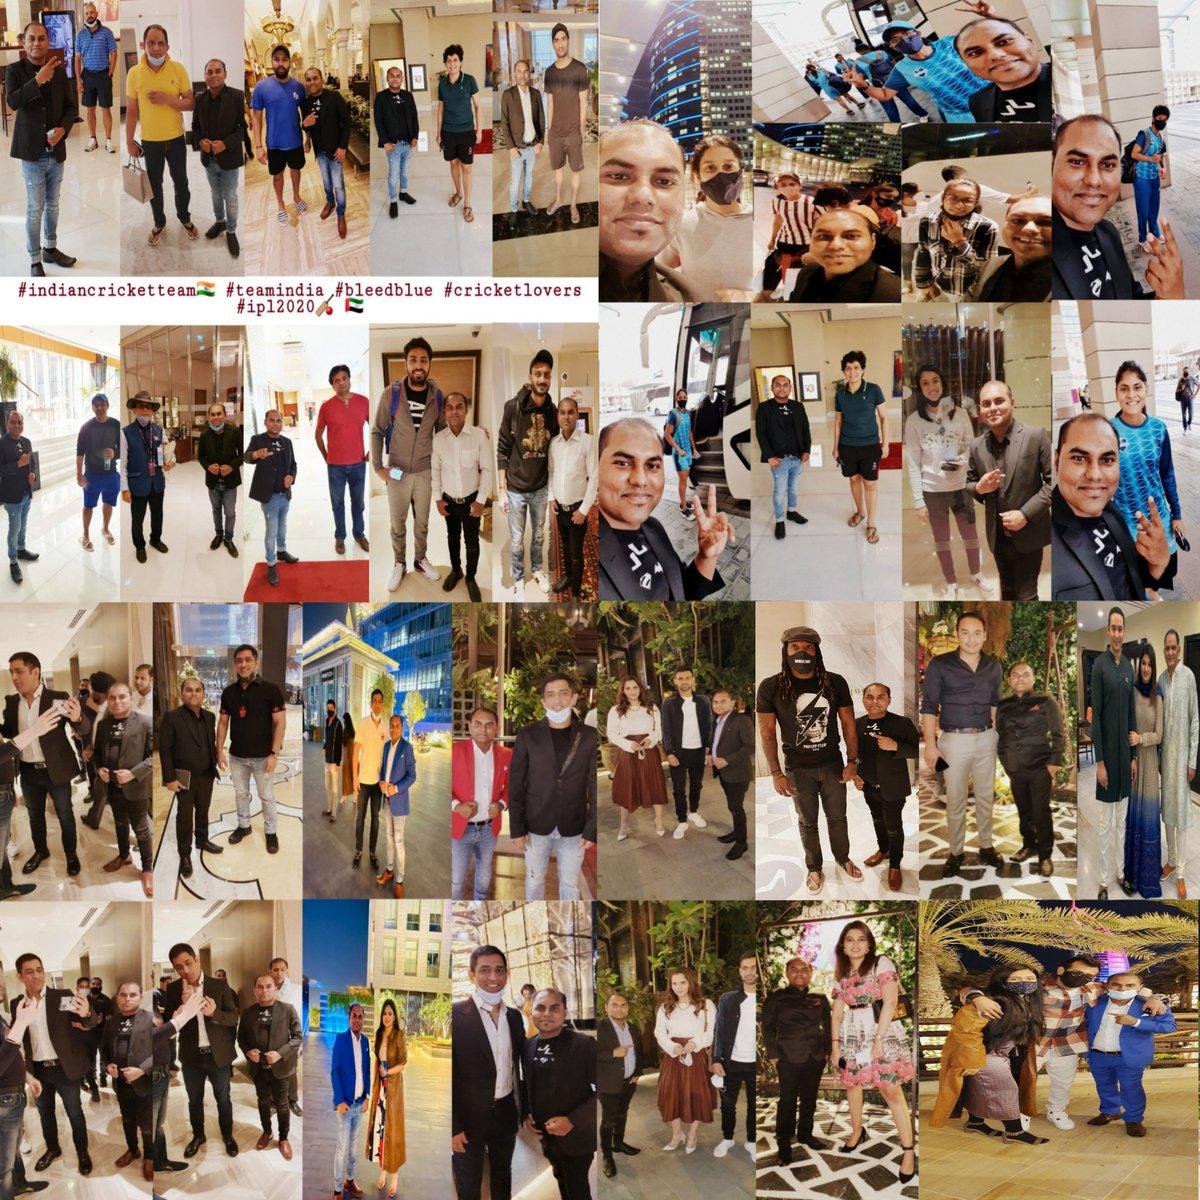 Most popular sports personality🤏😎 #mkartik #mohdazhar #rohitsharma #mann #rohan #sunilgavaskar #javagalsrinath   #radhayadav #harmanpreetkaur #poonamyadav #smriti #msdhoni #sakshisingh #shoaibmalik #saniamirza #chrisgayle #mohdasad #anammirza #journalism #dhanashree #yuzvenda